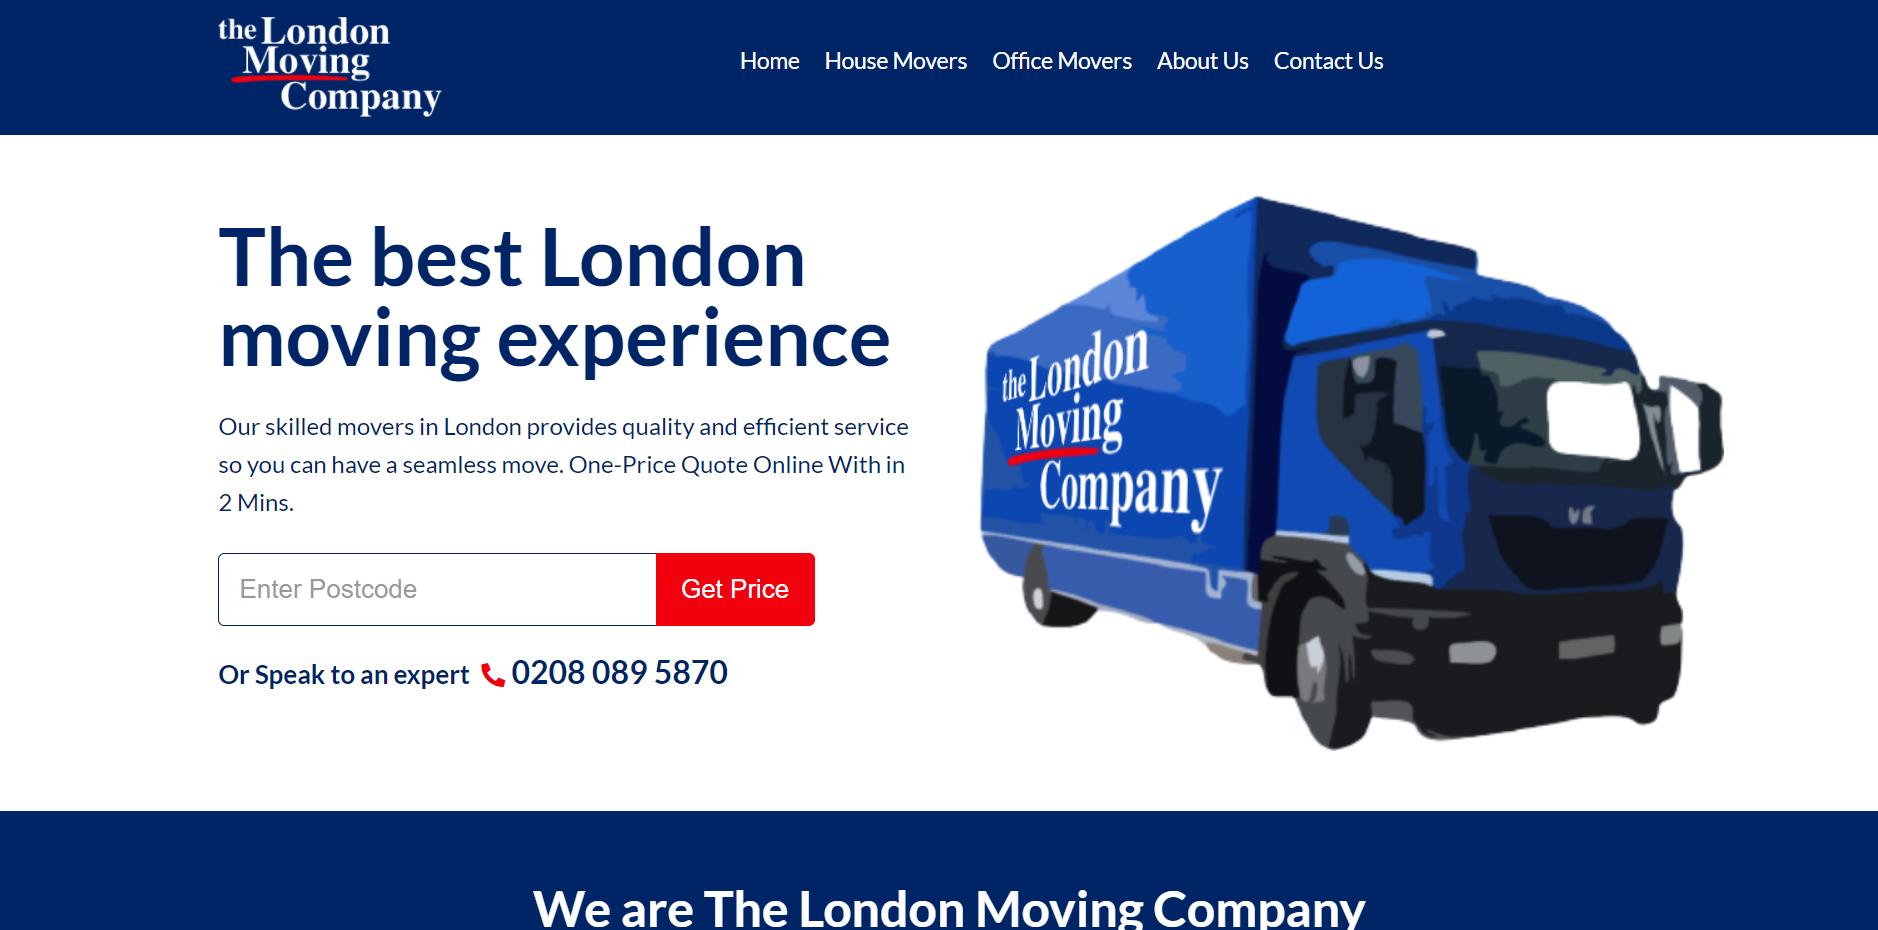 The London Moving Company